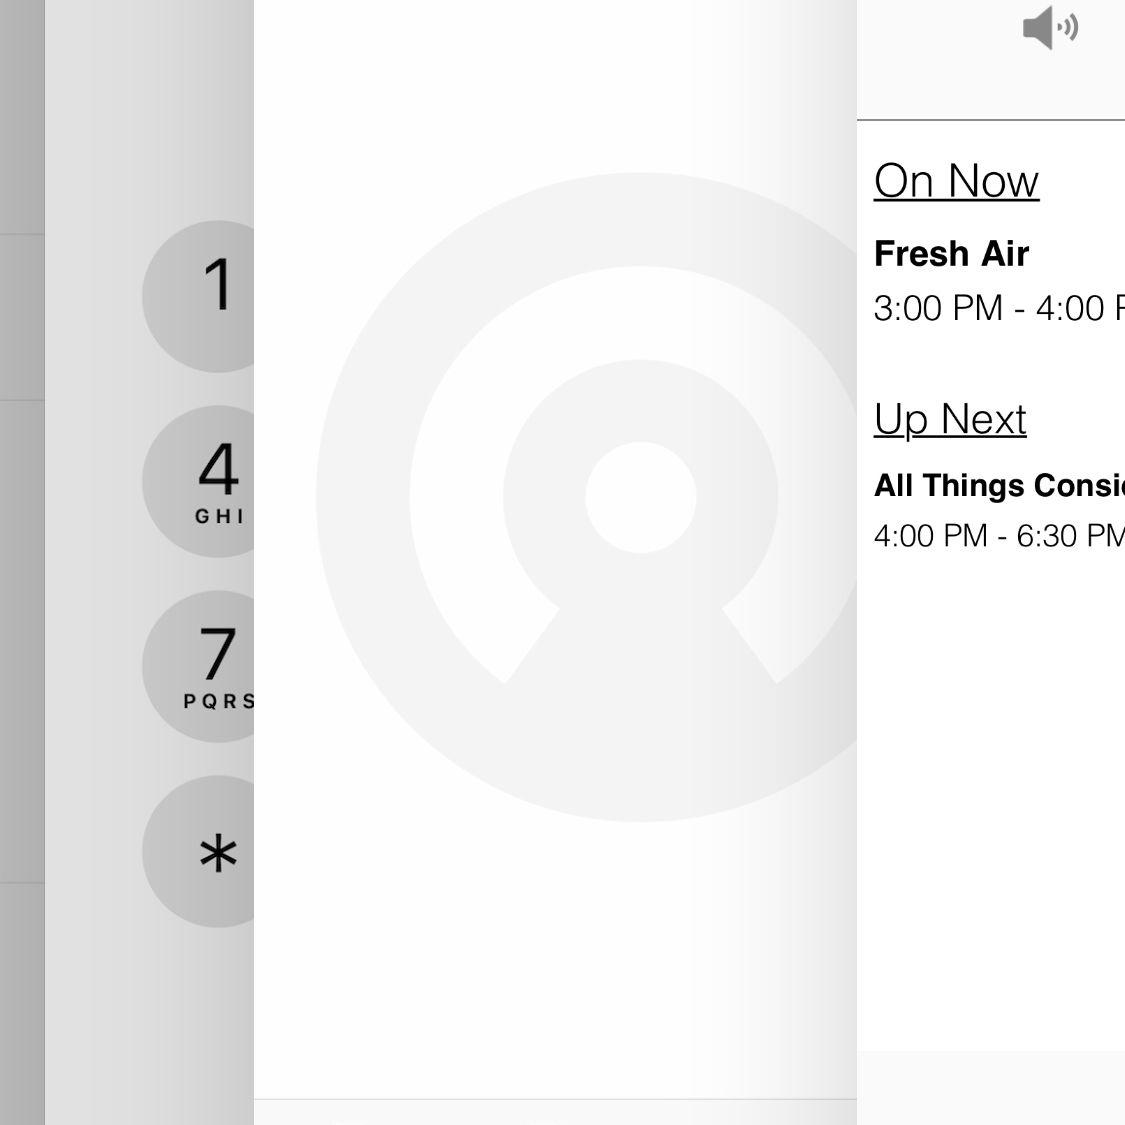 screenshot of using handoff in iOS 12